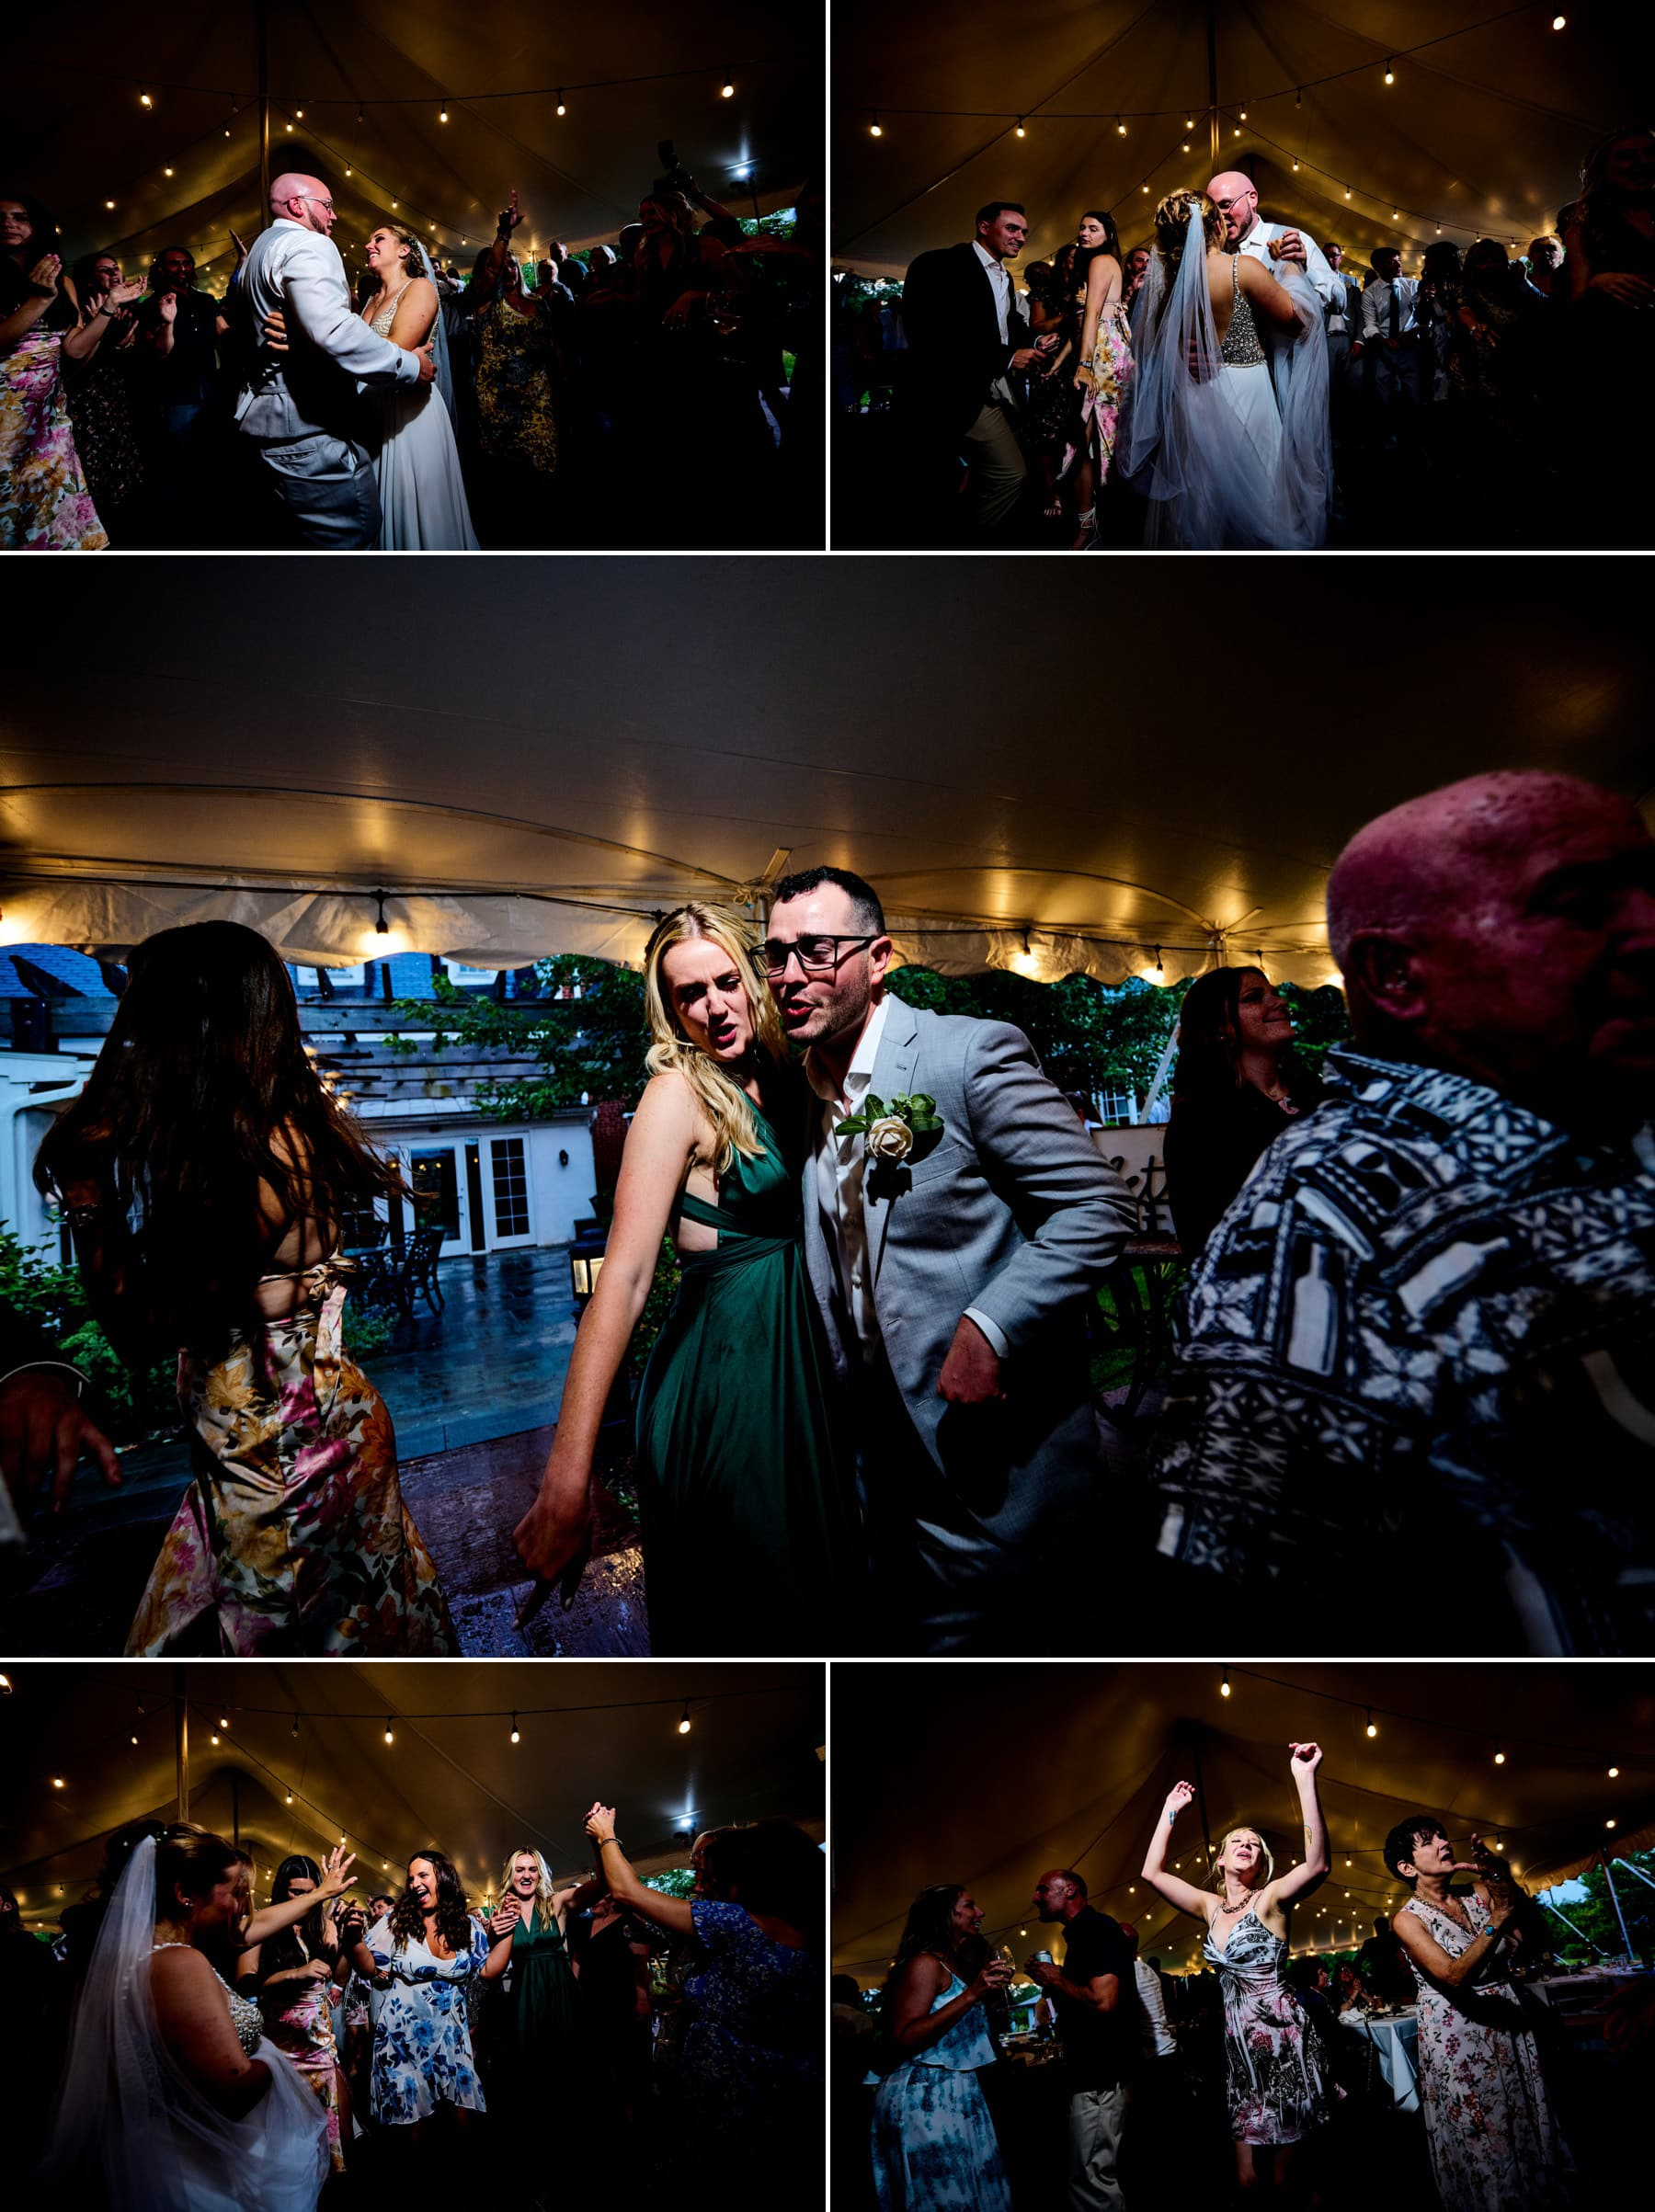 wedding dance floor photos at Brick Farm Tavern